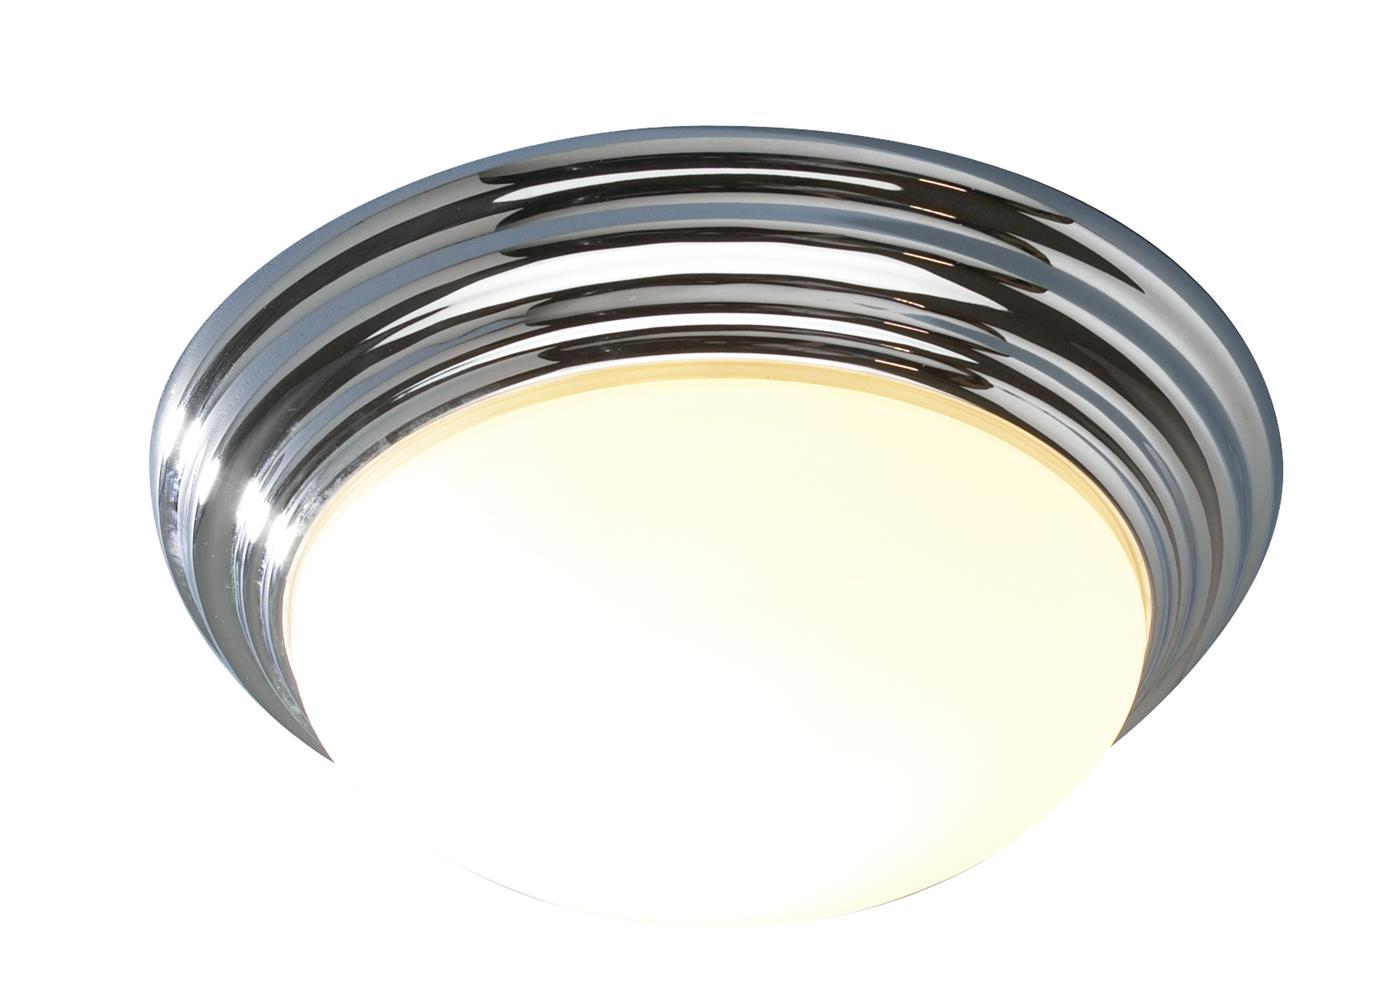 Traditional Bathroom Barclay Flush Fitting Glass Ceiling: BAR5250 Barclay Bathroom Small Flush Fitting In Chrome